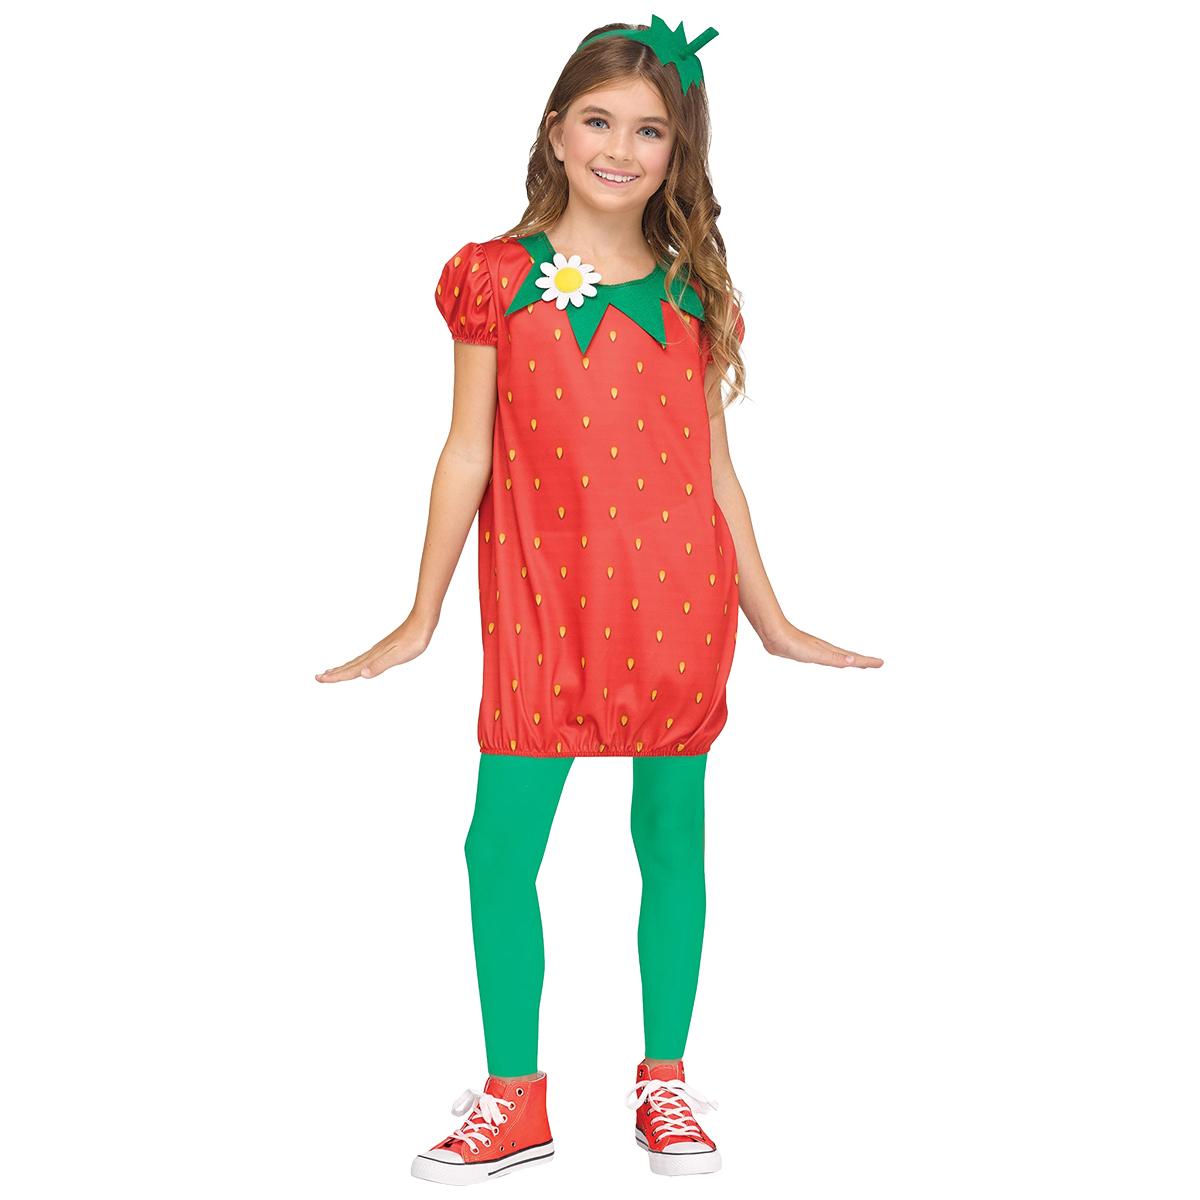 Barndräkt, jordgubbe